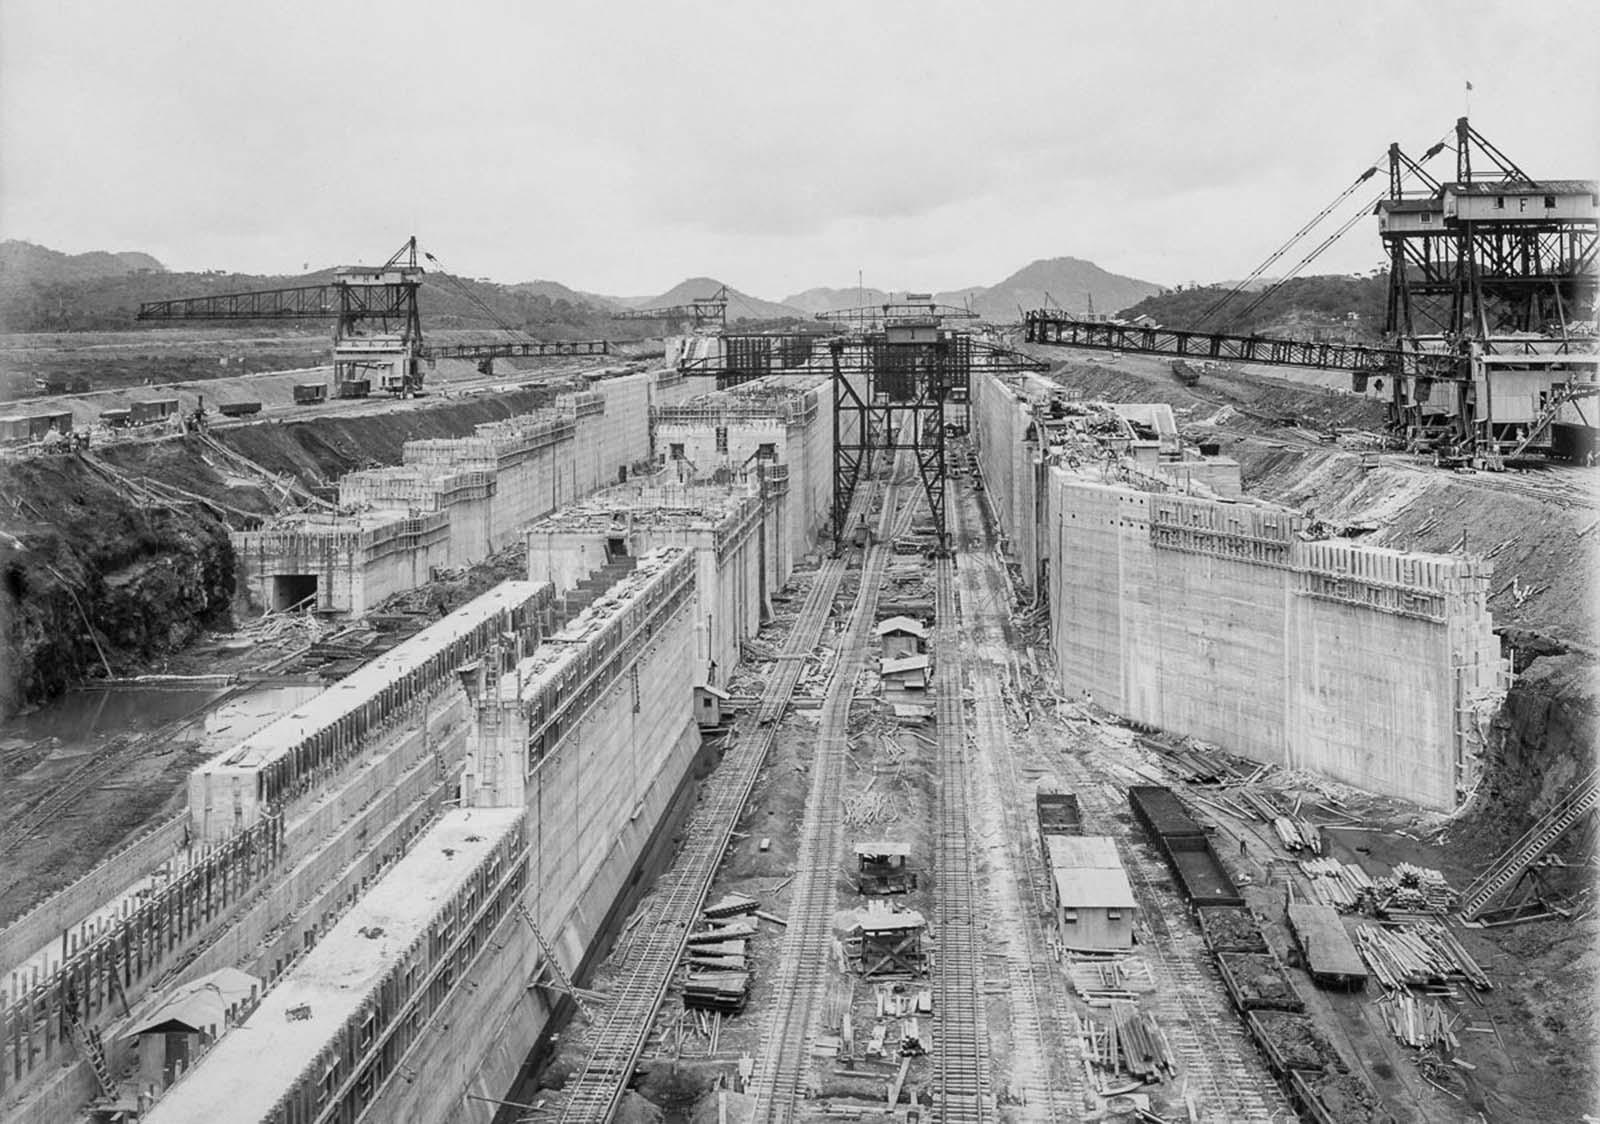 The Miraflores lower locks under construction. 1912.